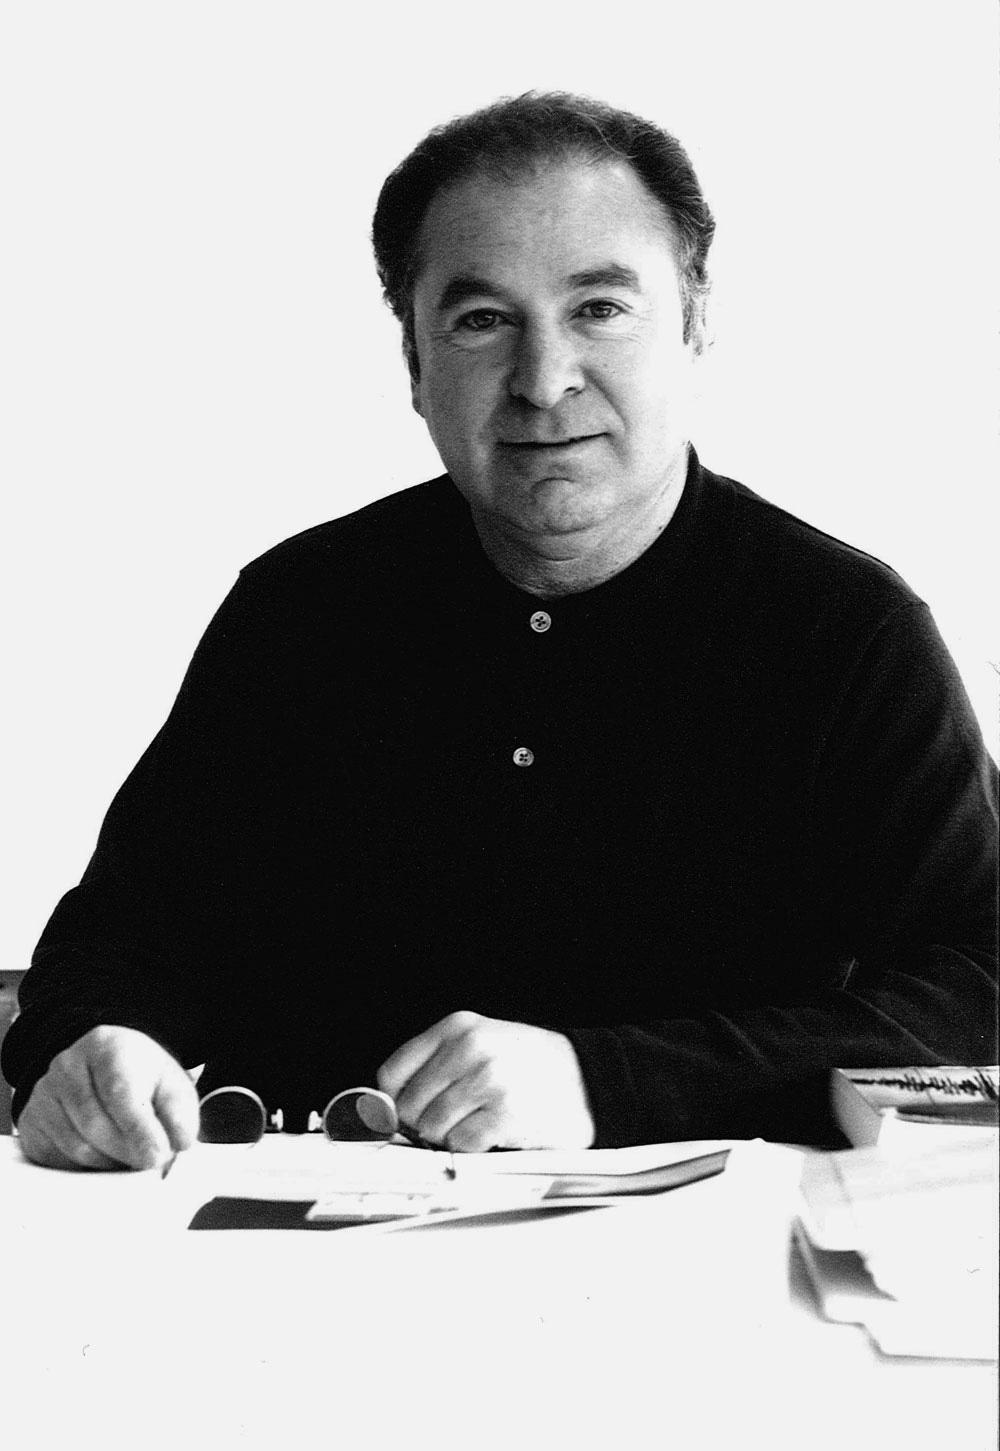 Stanley-Saitowitz